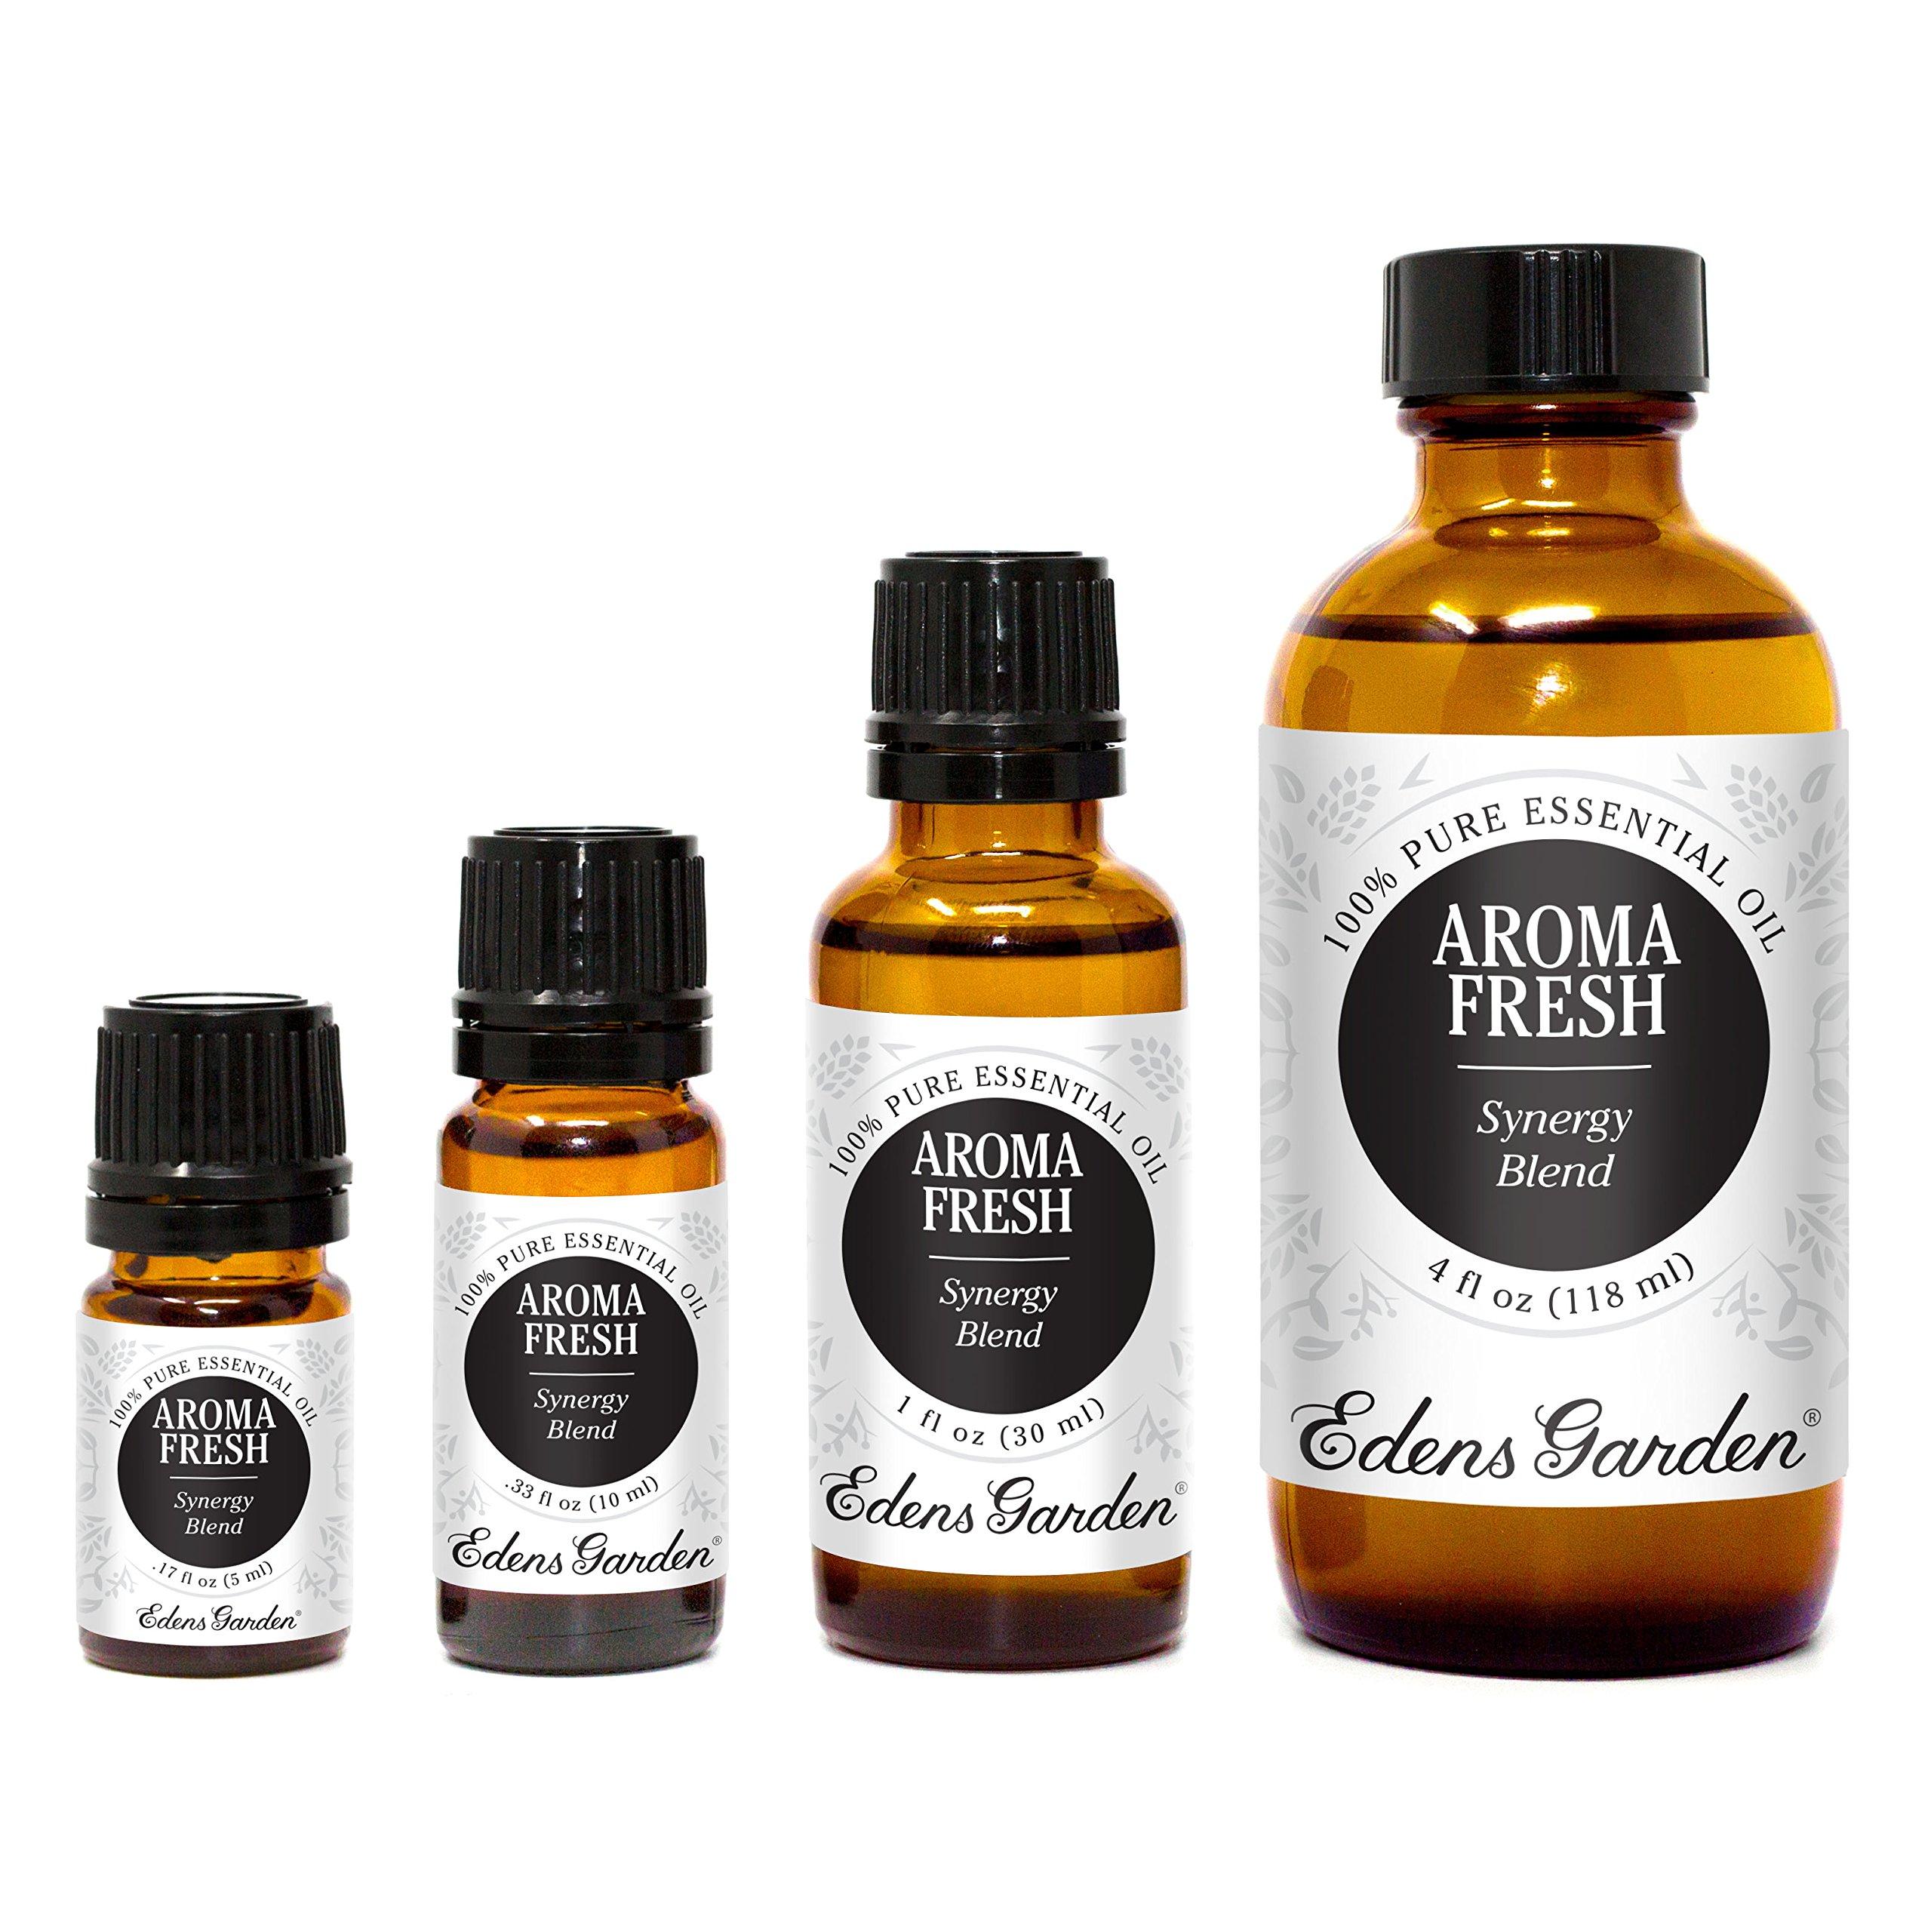 Edens Garden Aroma Fresh 30 ml 100% Pure Therapeutic Grade GC/MS Tested (Lemon, Lime, Siberian Fir Needle, Austrian Fir Needle, Pine, Citronella, Tea Tree, Cilantro)